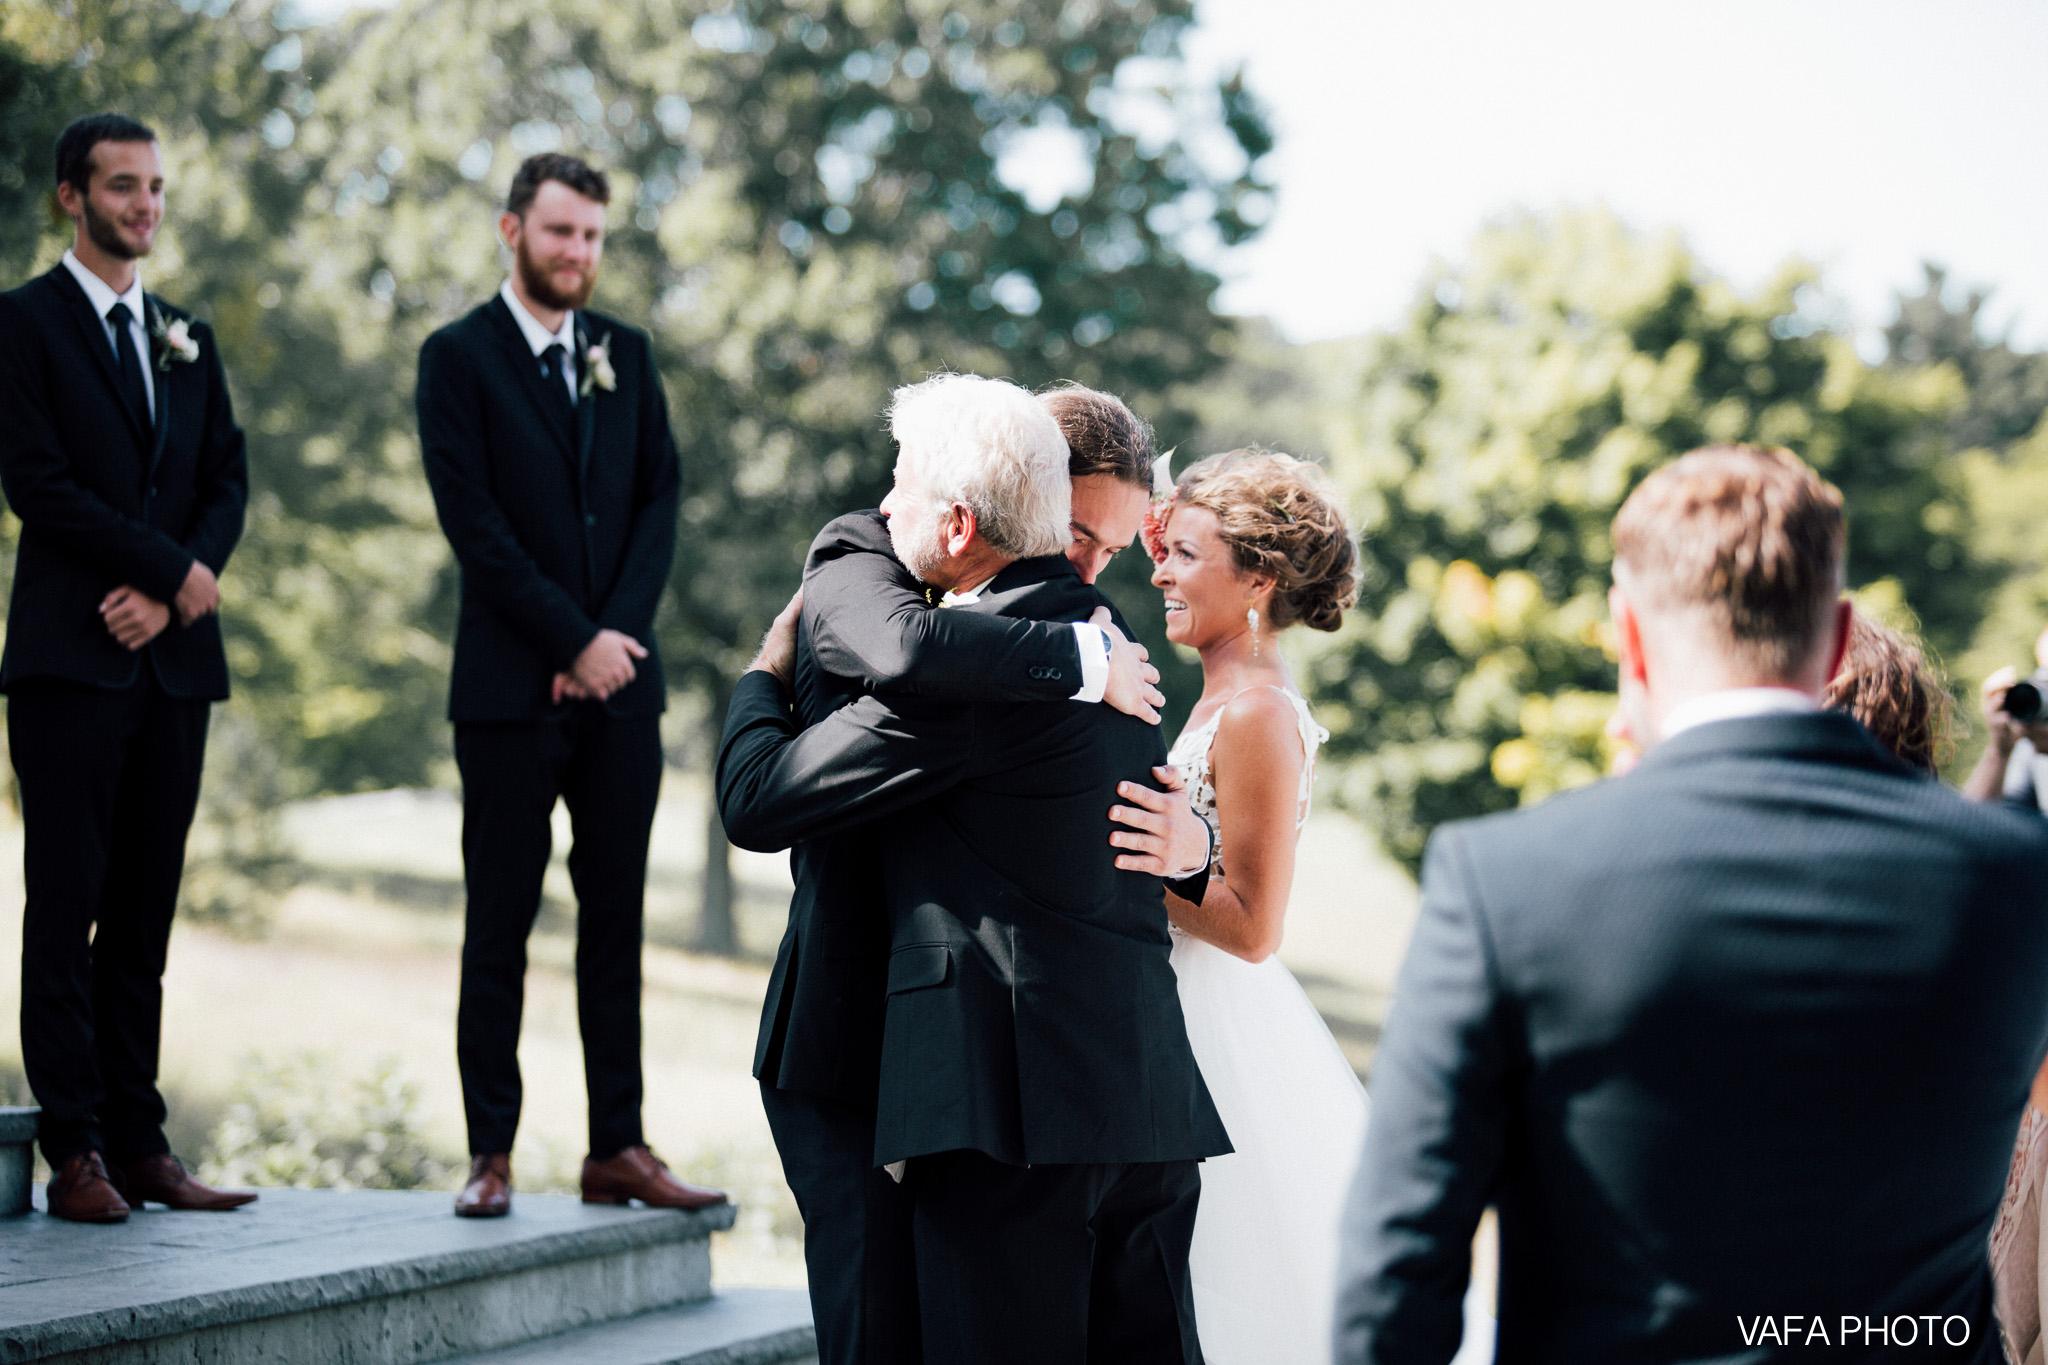 The-Felt-Estate-Wedding-Kailie-David-Vafa-Photo-315.jpg